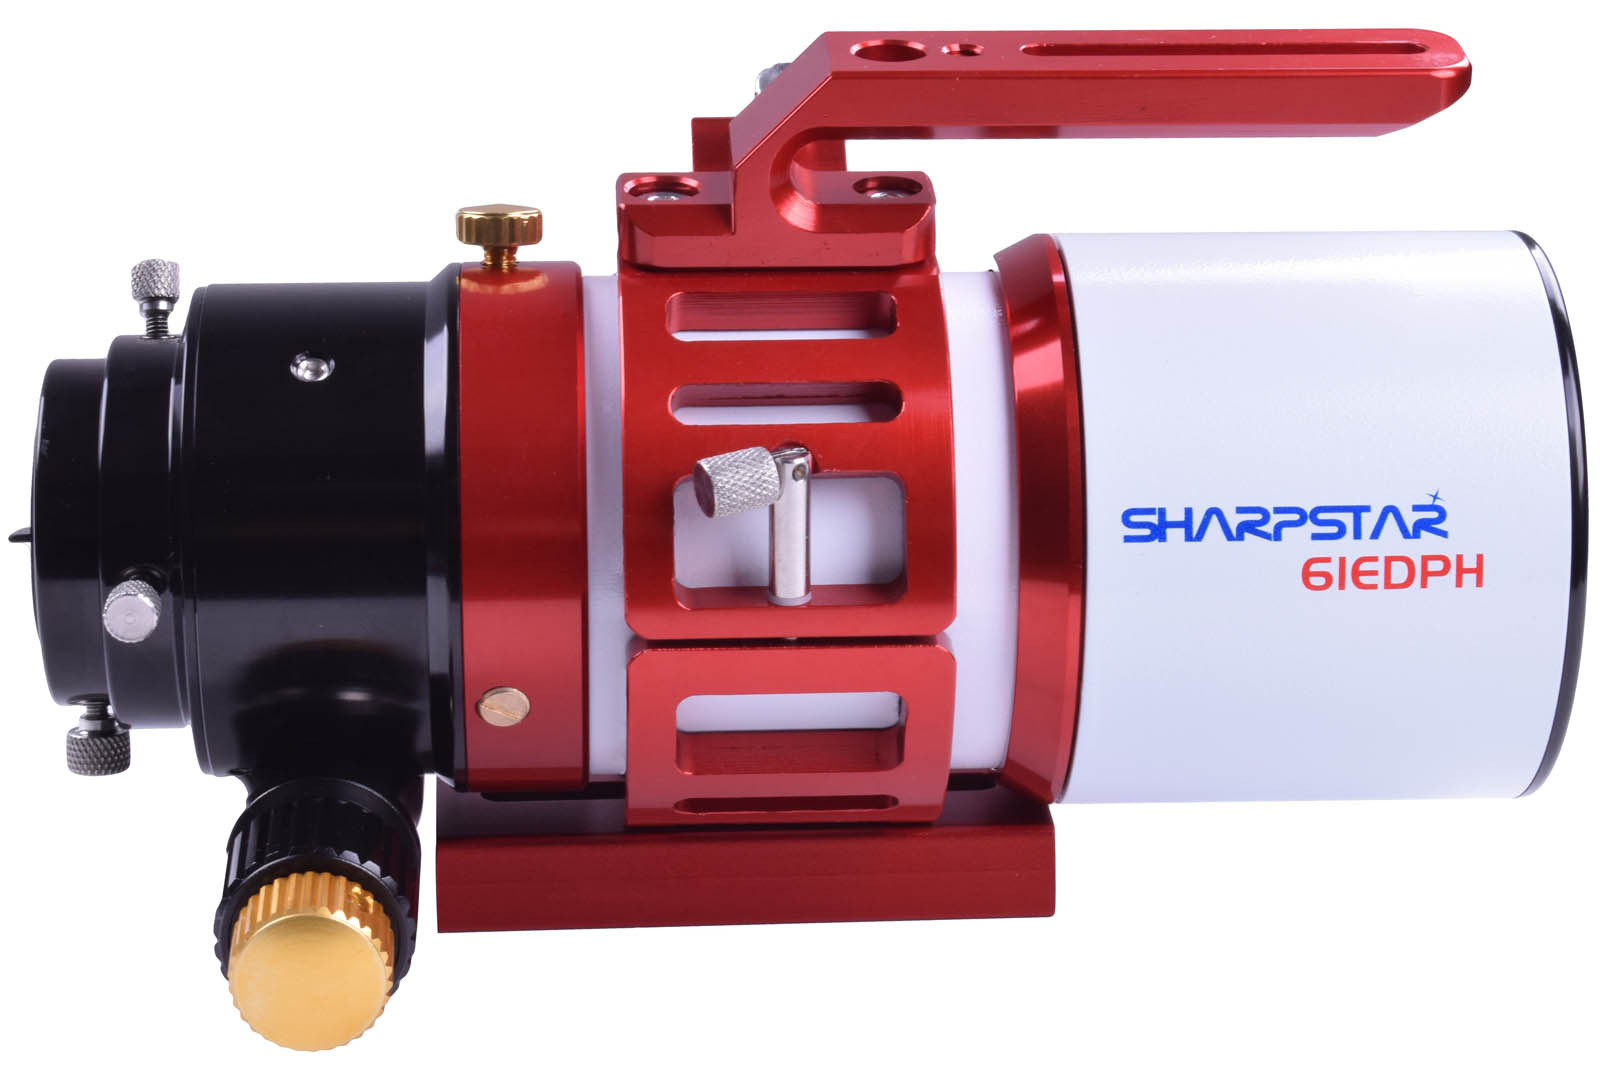 SharpStar 61EDPH ED Doublet Apochromatic Refractor Telescope with f/4.5 0.8x Reducer/Flattener - BLACK FRIDAY